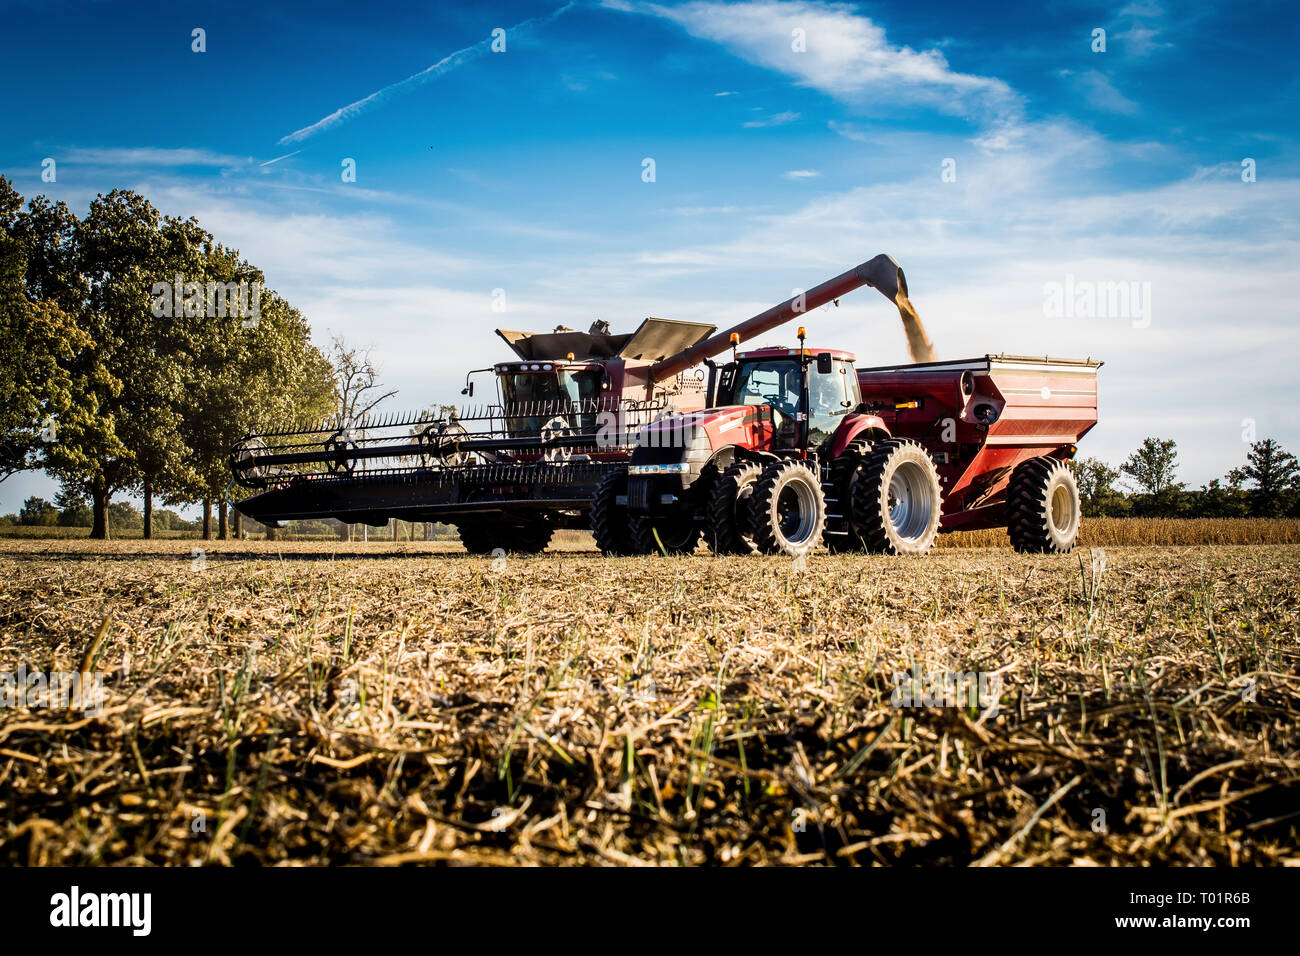 Grain harvester finishing up soybean harvest, Bond County, Illinois - Stock Image